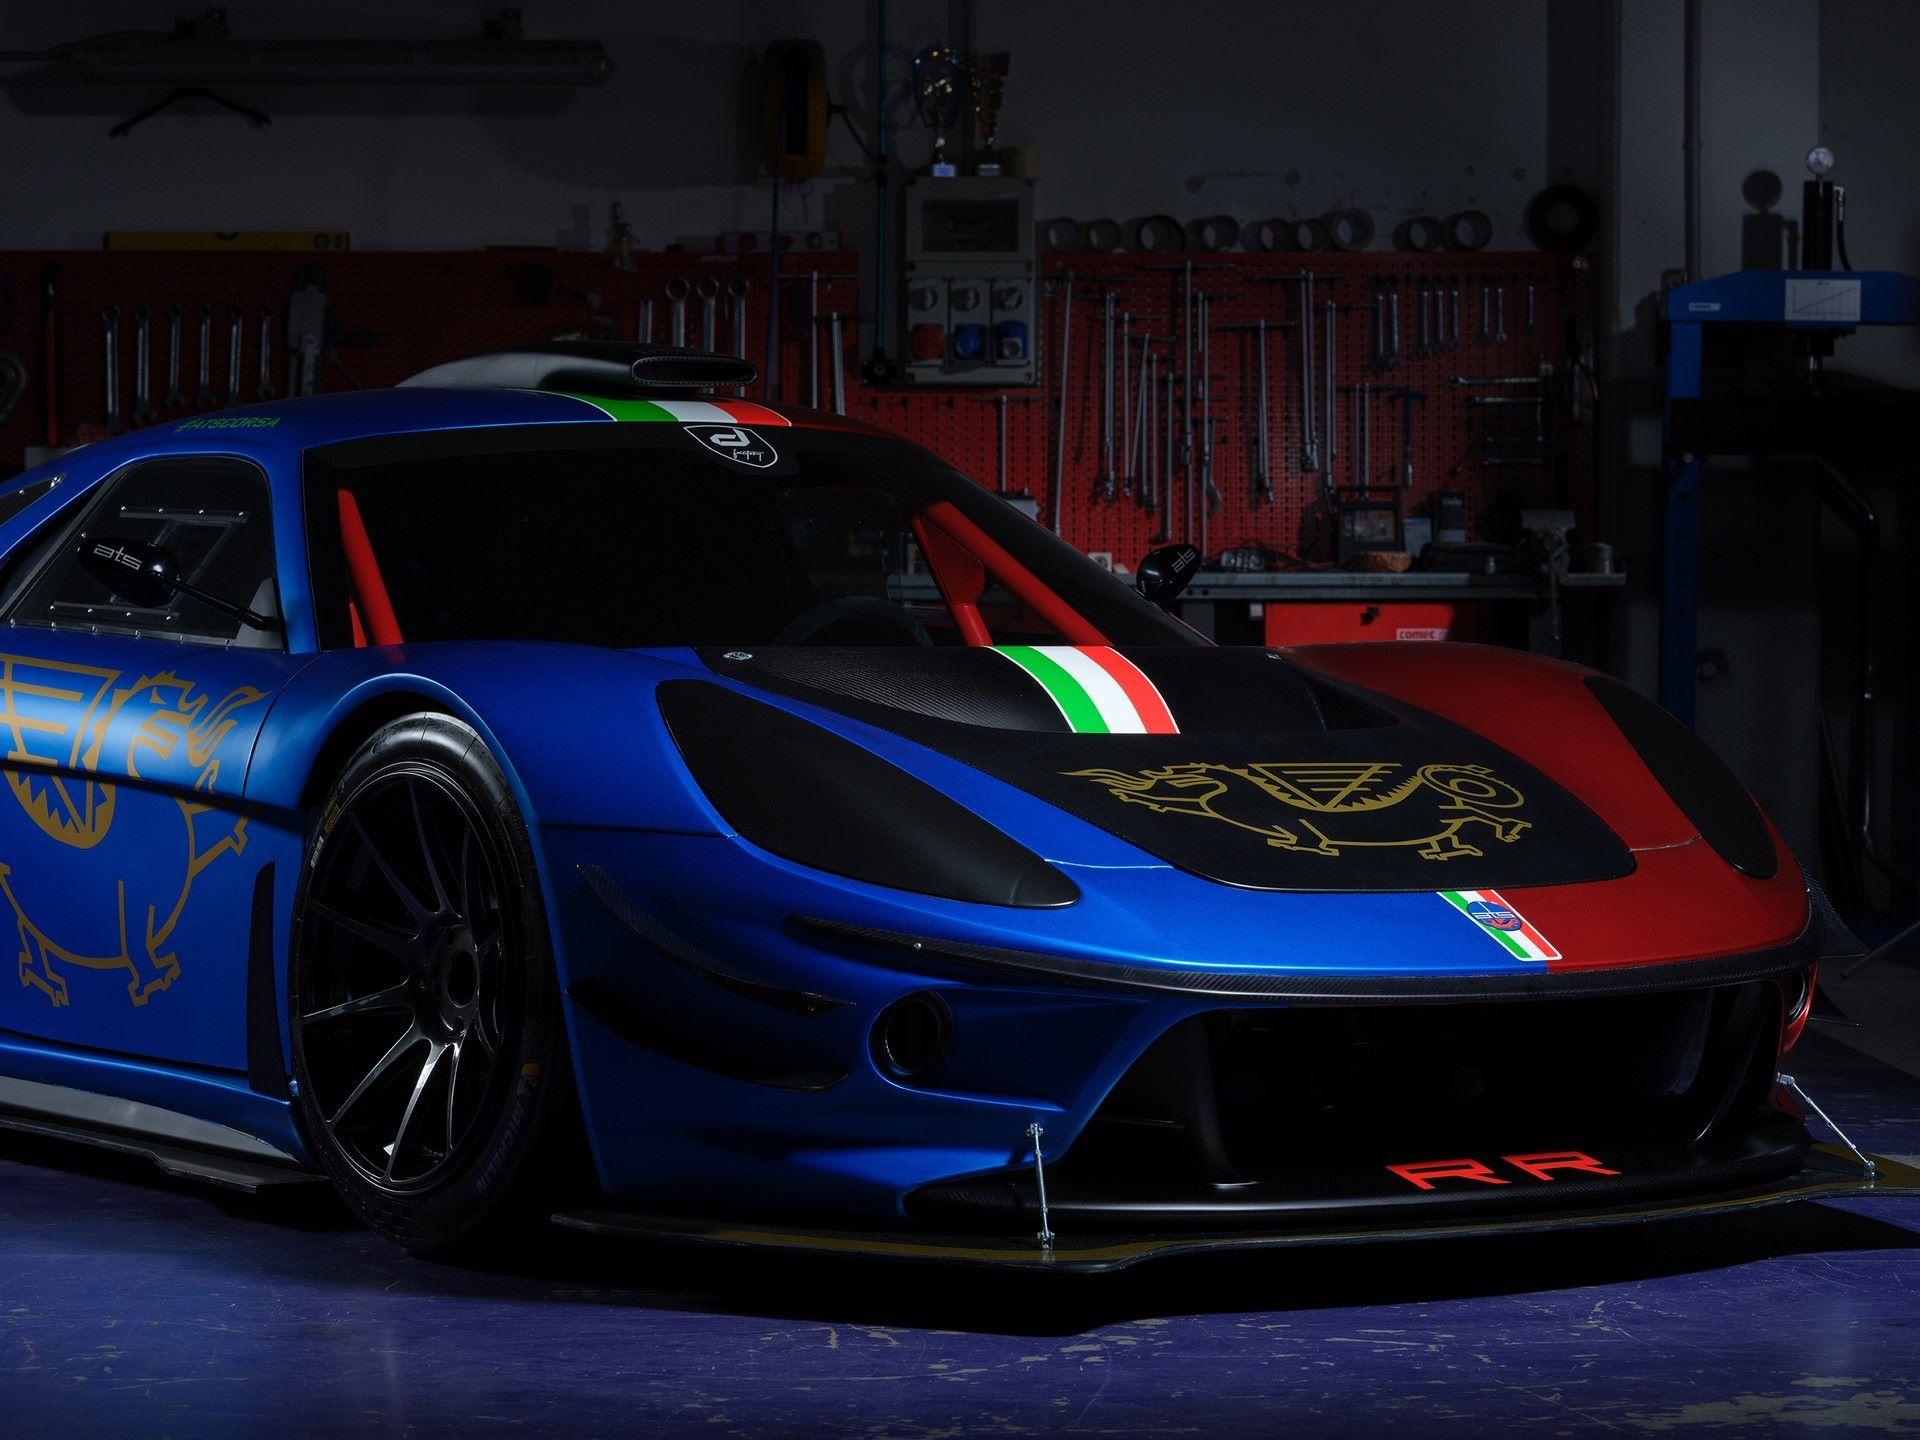 ATS-Corsa-RR-Turbo-32